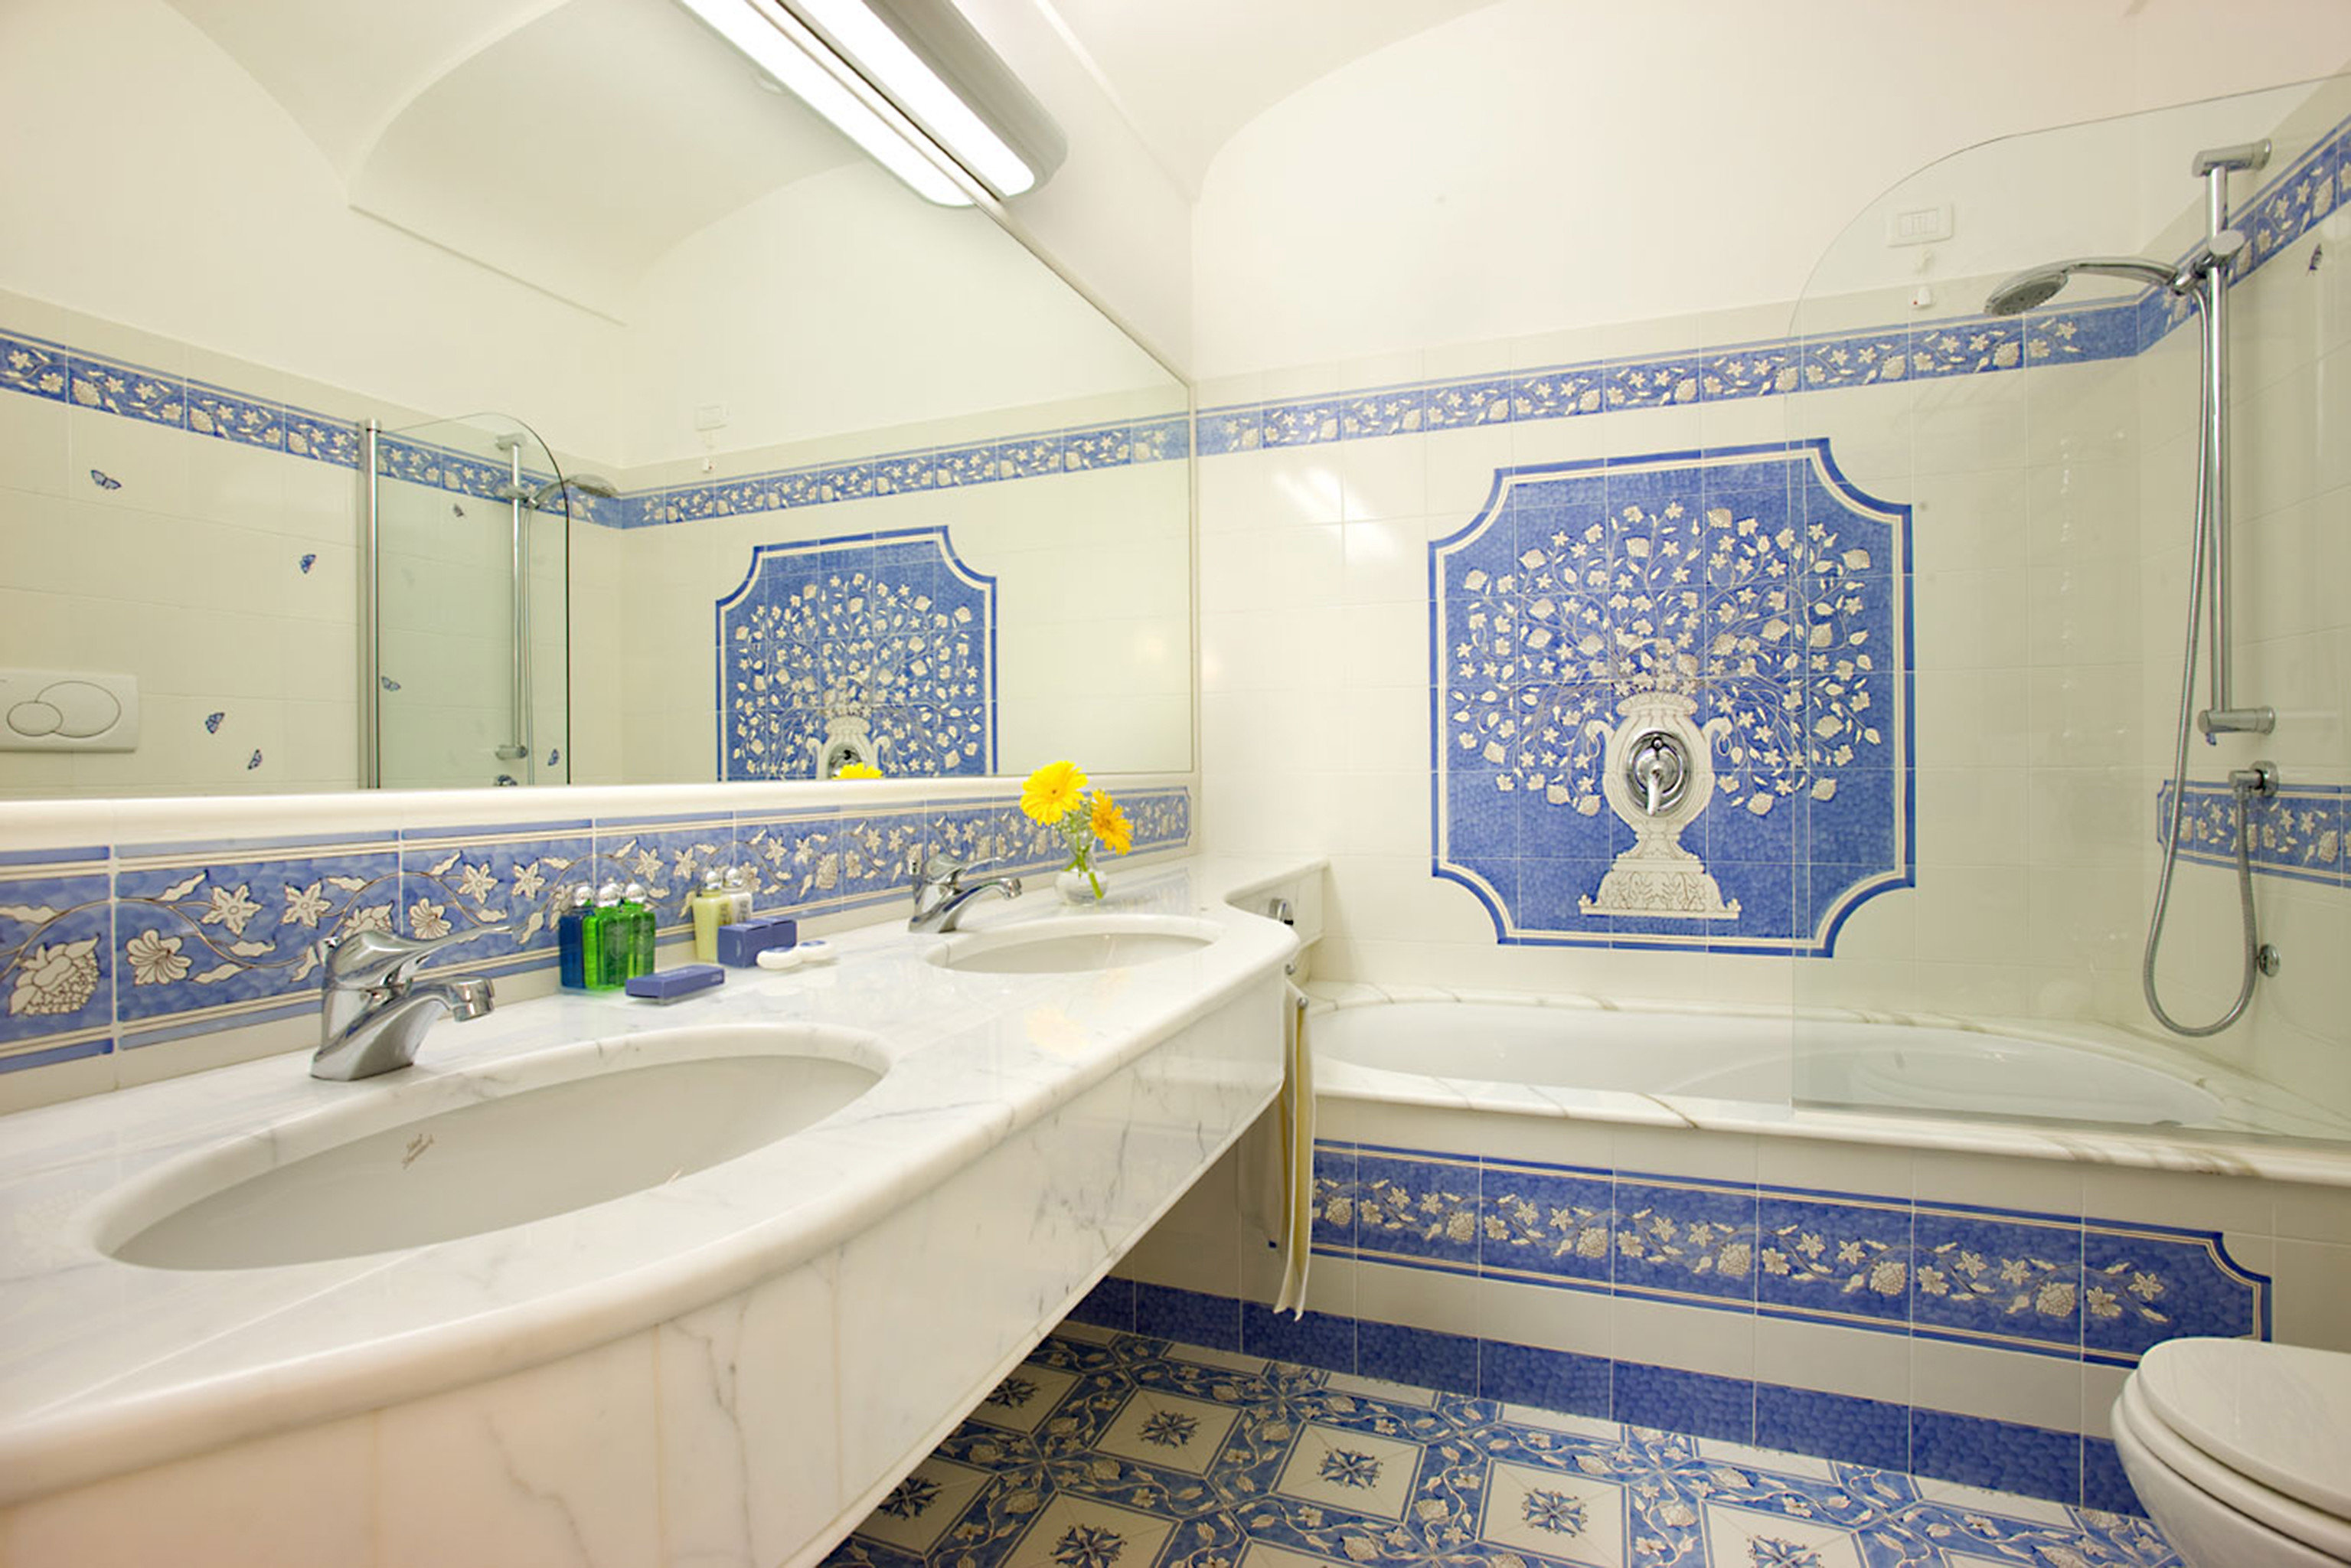 Bath Classic Scenic views Sea bathroom sink toilet property mirror swimming pool Suite bathtub tub tile tiled